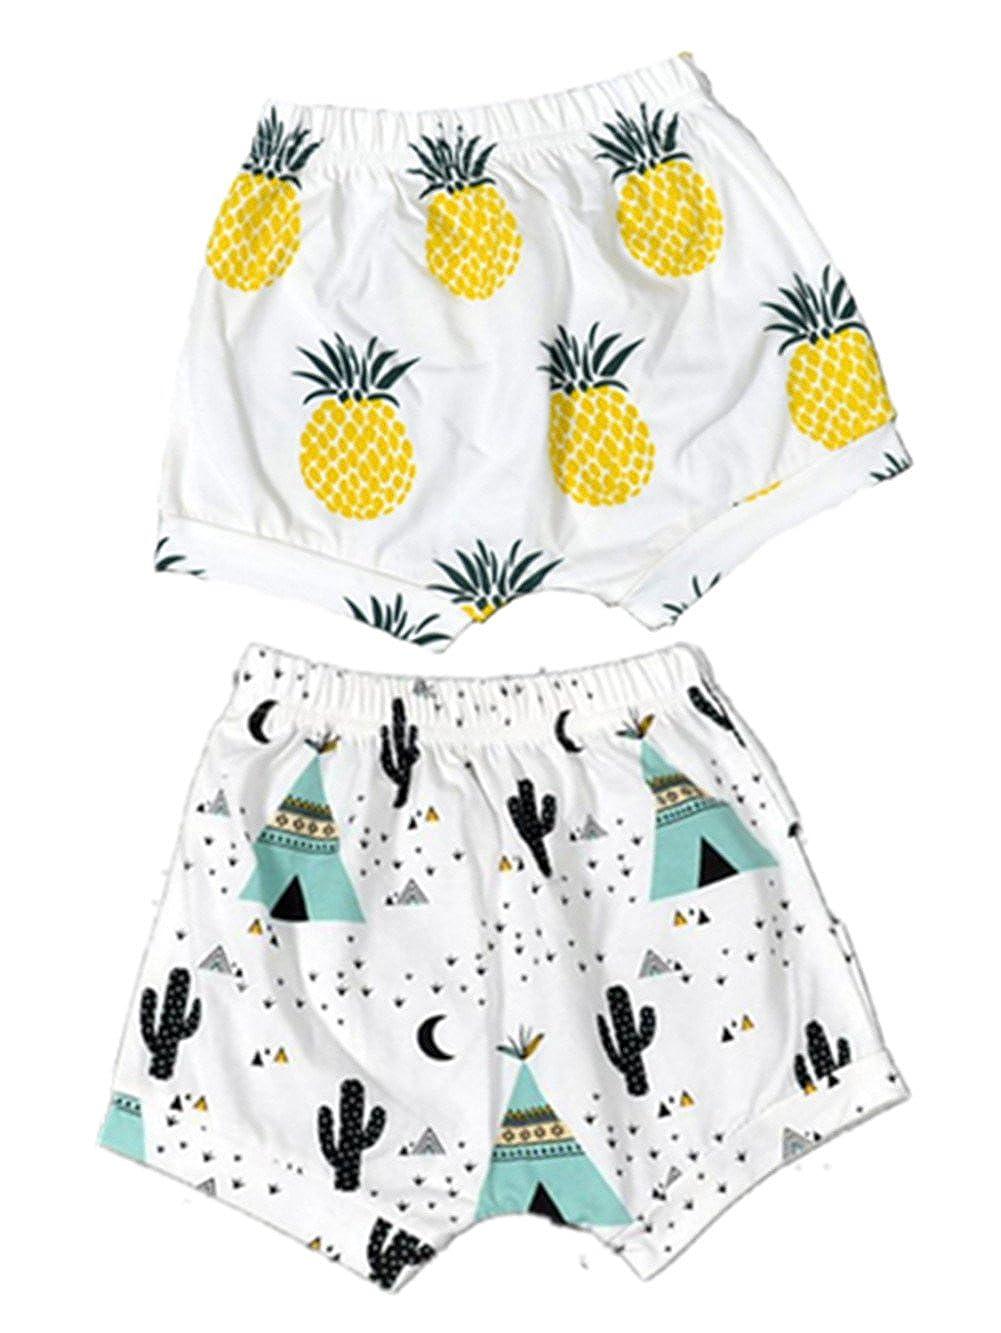 BIGBUY 2pcs Summer Baby Fruit Printed Cotton Shorts Harem Pants Bloomers for 0-4 Years Old AYIYO